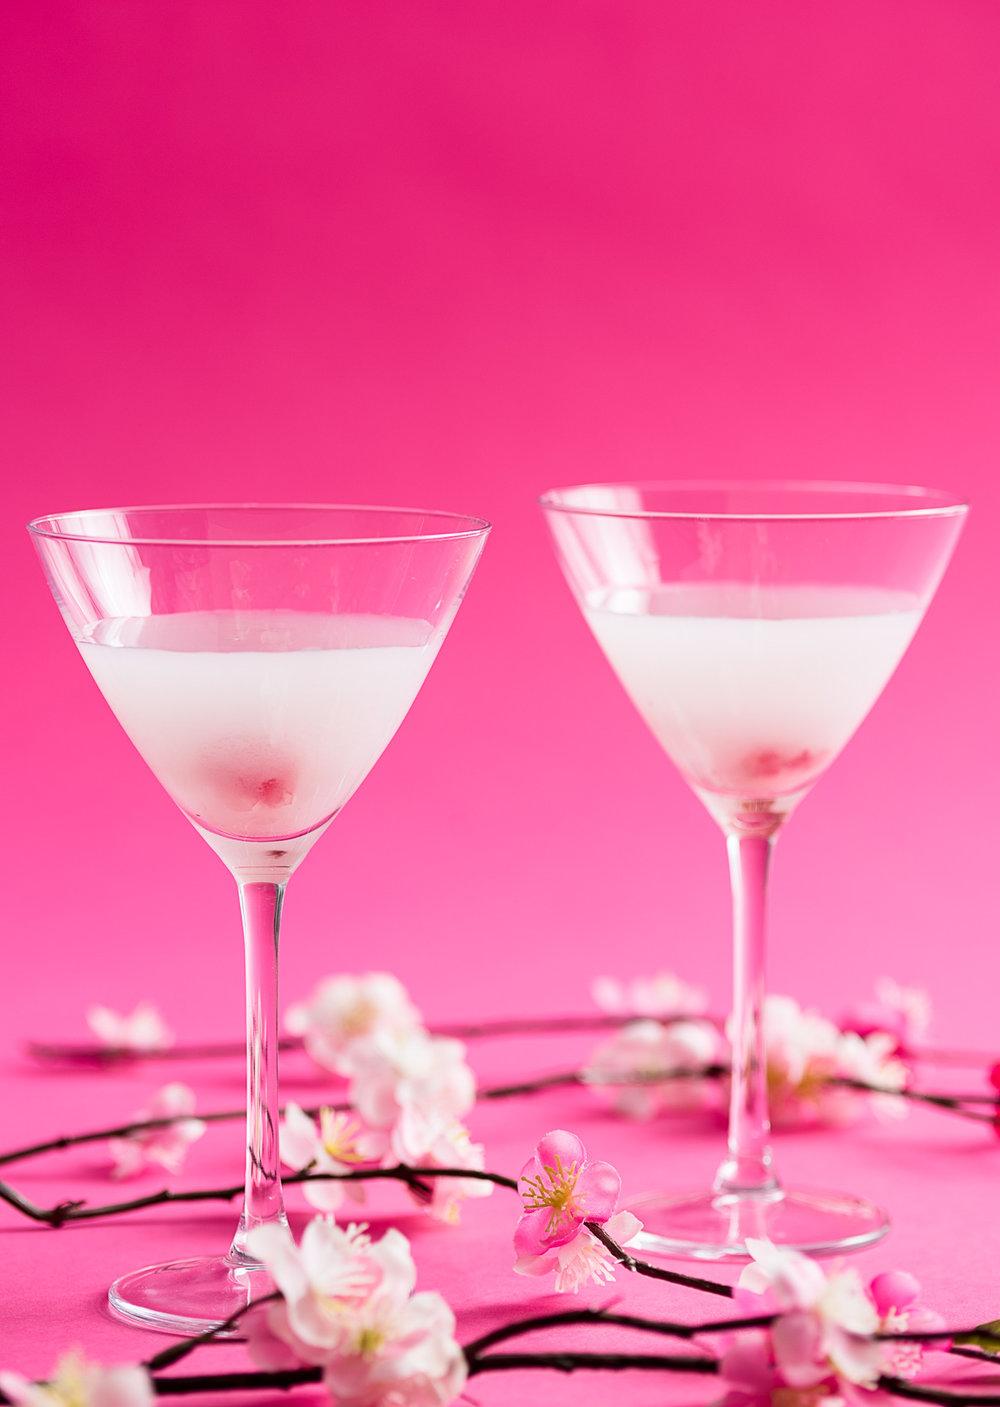 From Japan - The Wabi Sabi Cocktail (recipe from Nomageddon) -